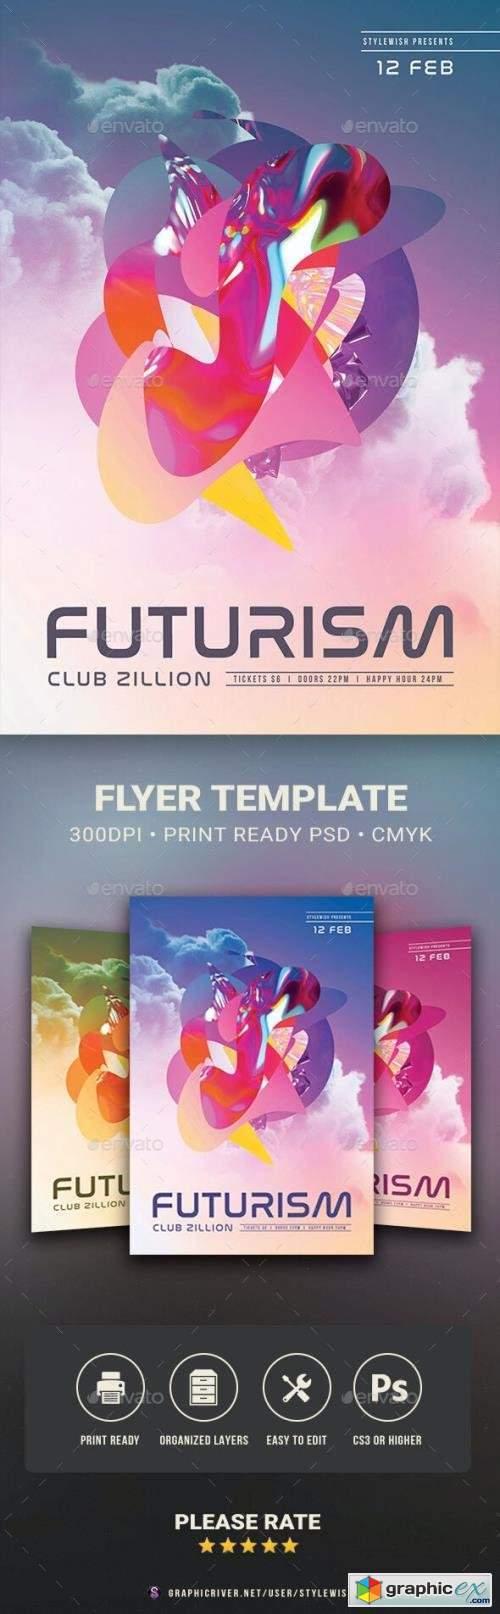 Futurism Flyer